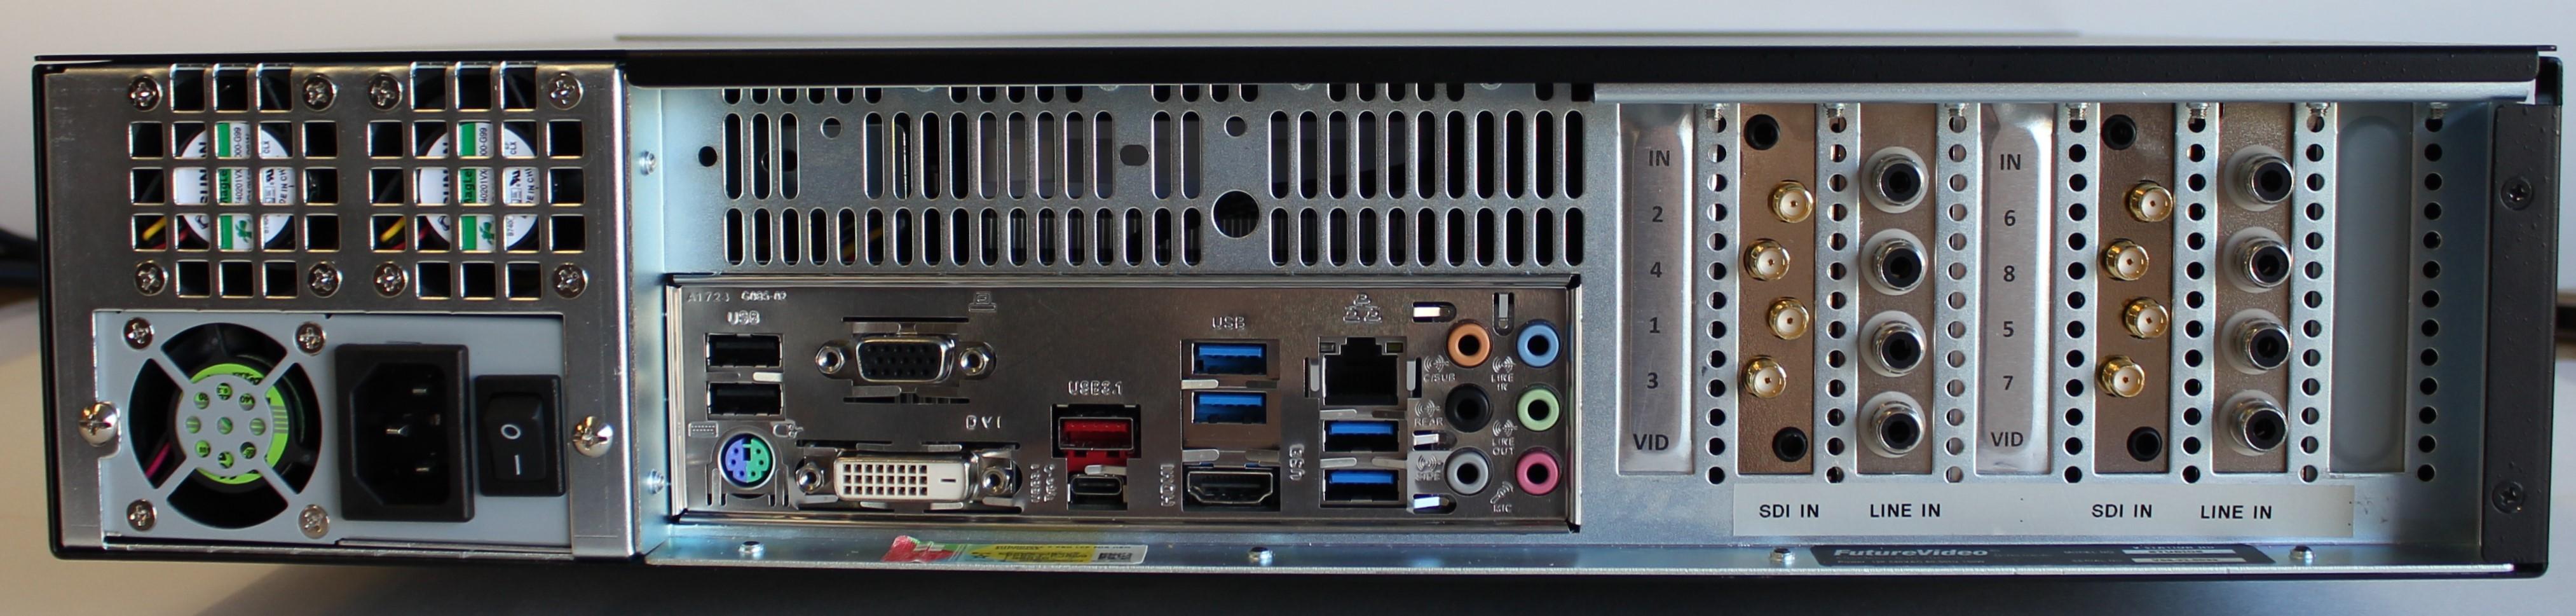 Studio4-HDMI-Rear-Panel